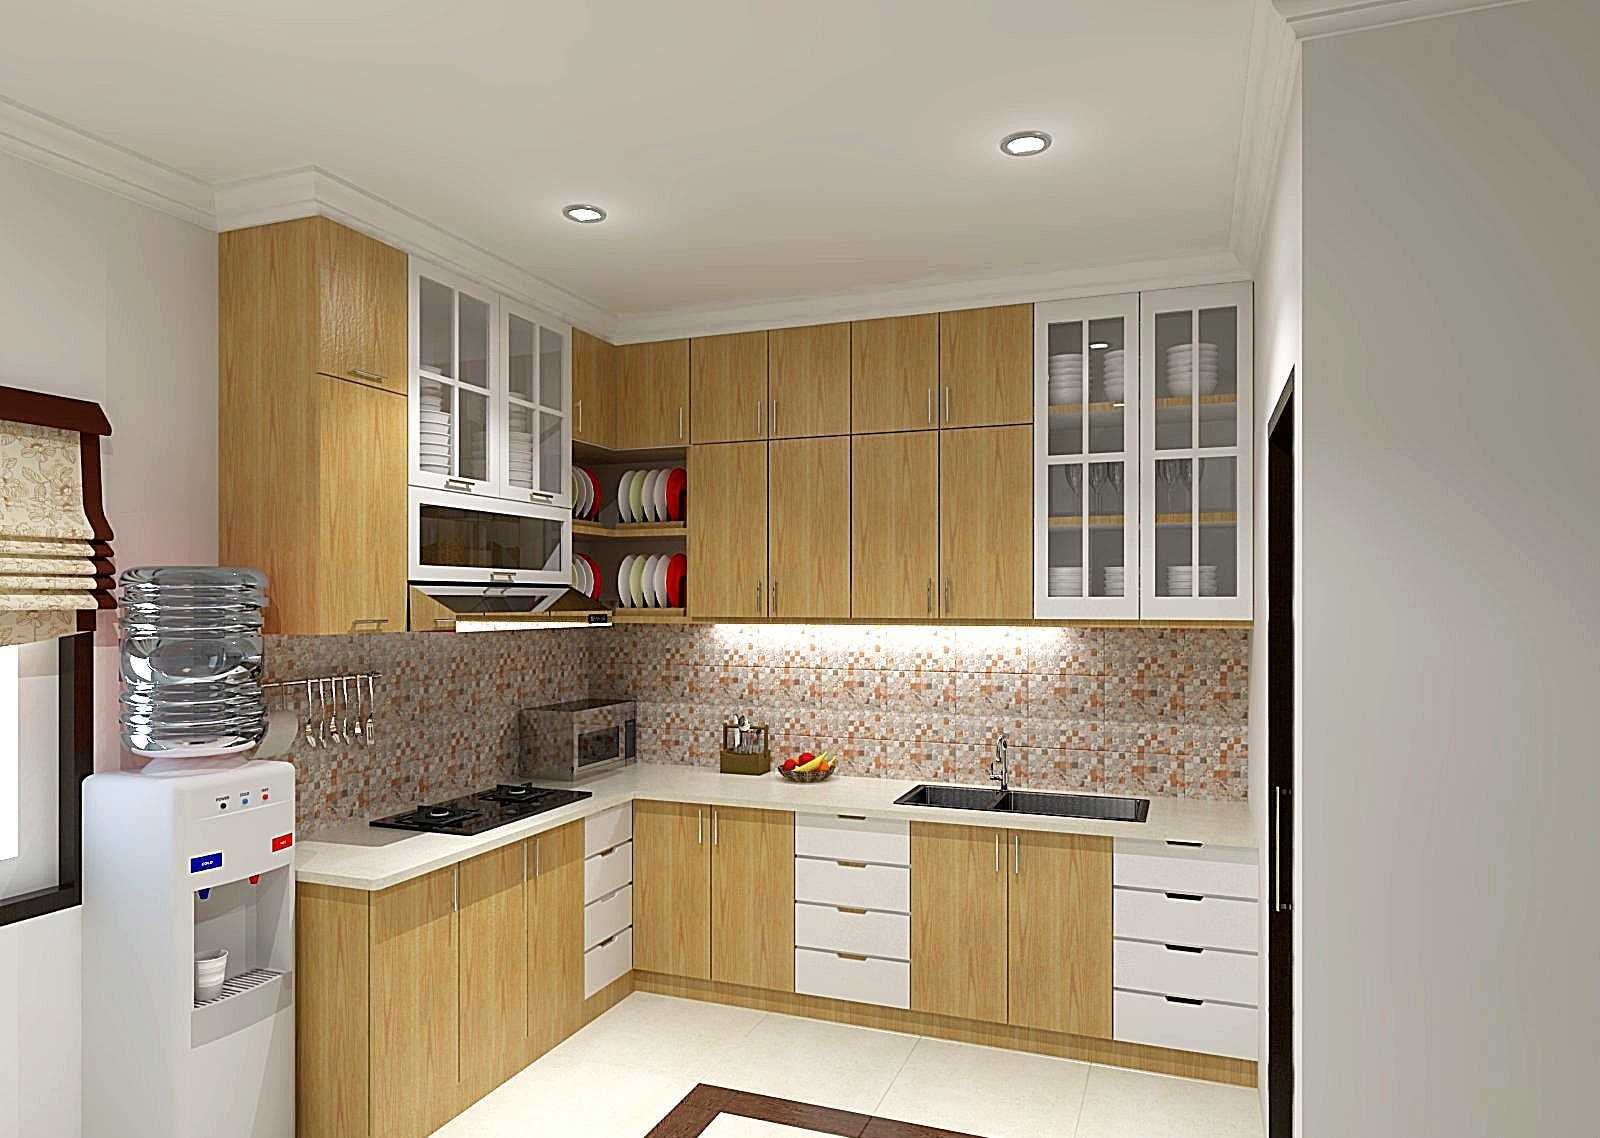 Artelier Rizaldy Kitchen  Medan  Medan  Dapur Kontemporer  22160